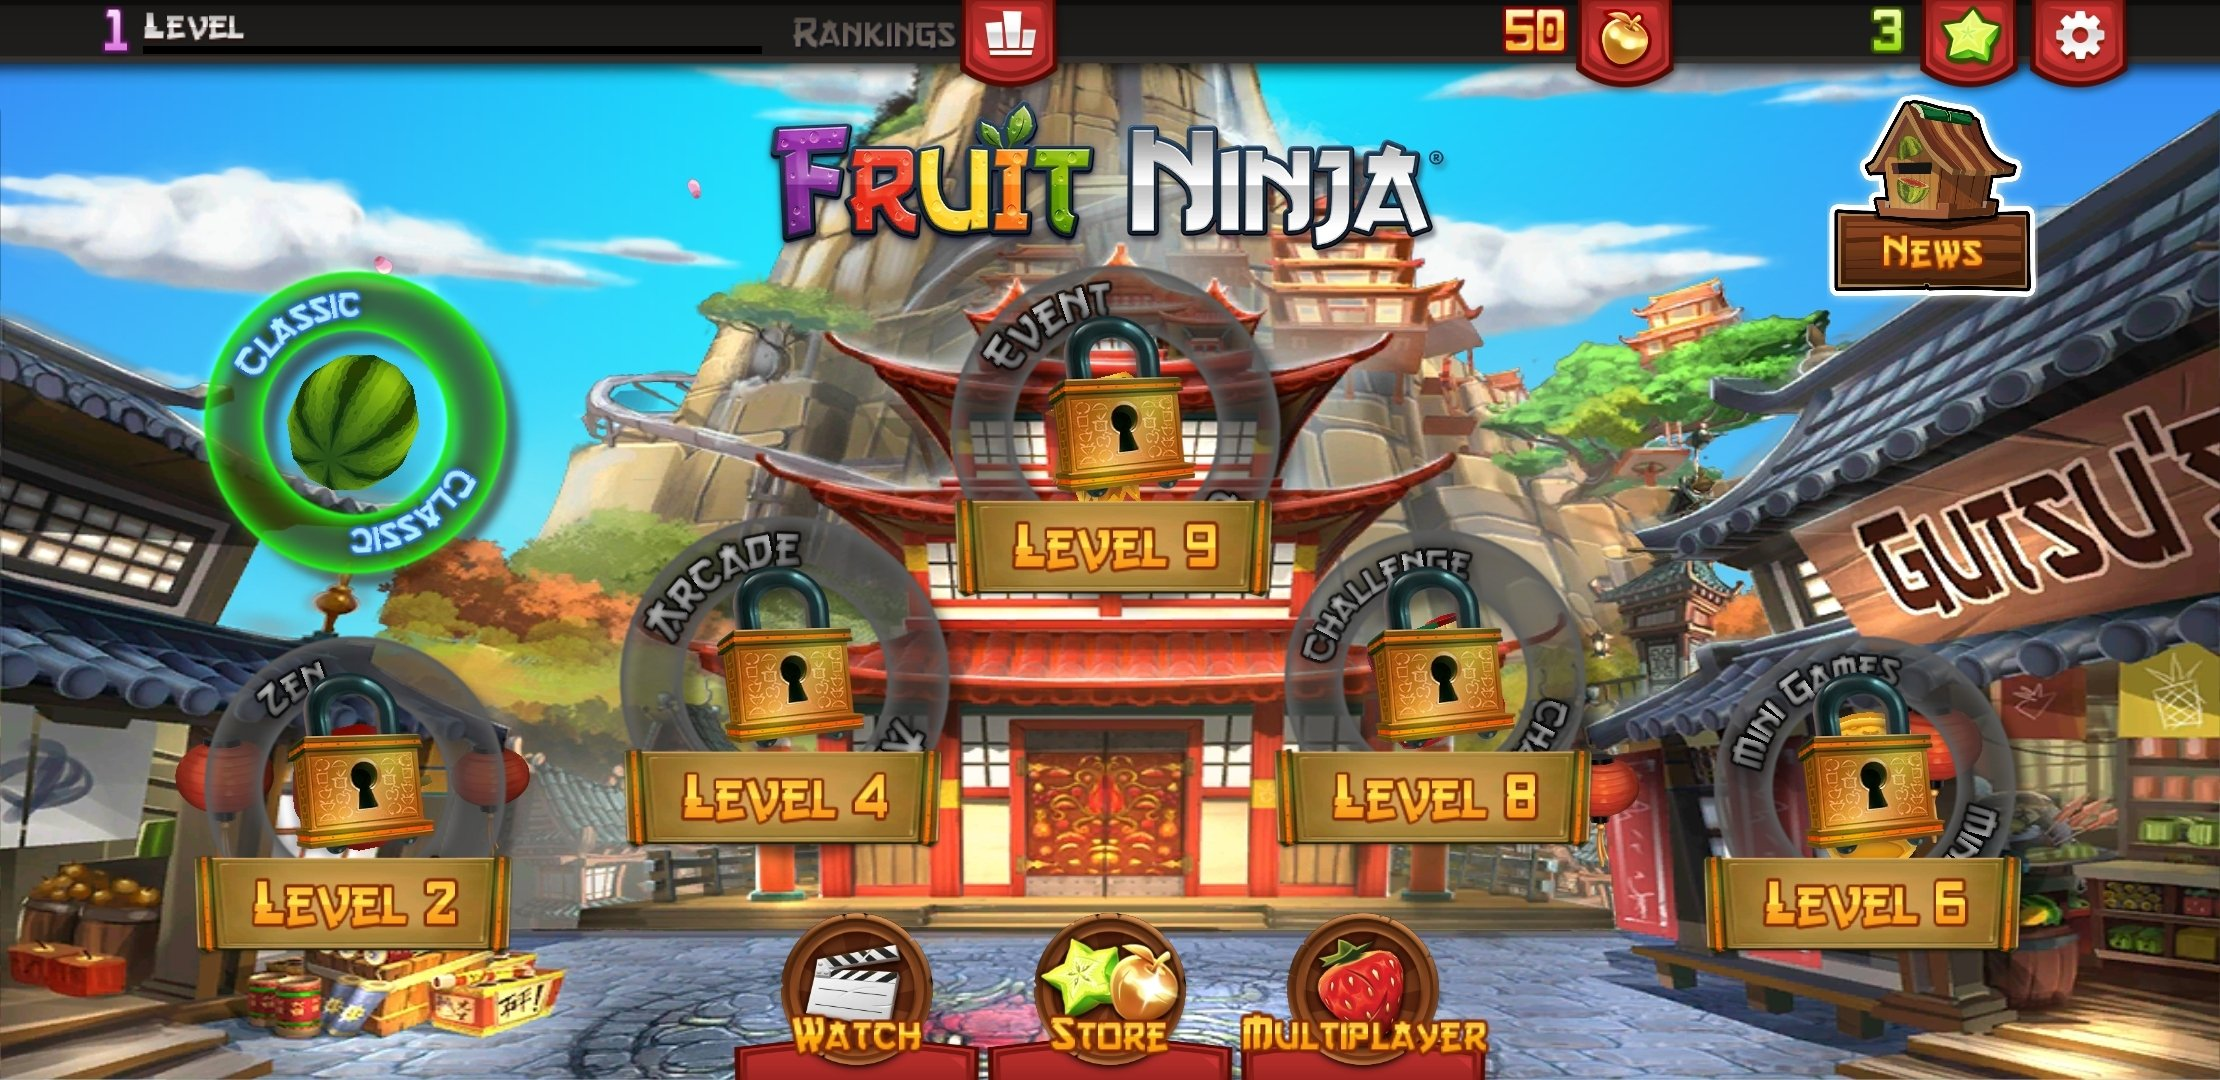 free download fruit ninja for mobile phones